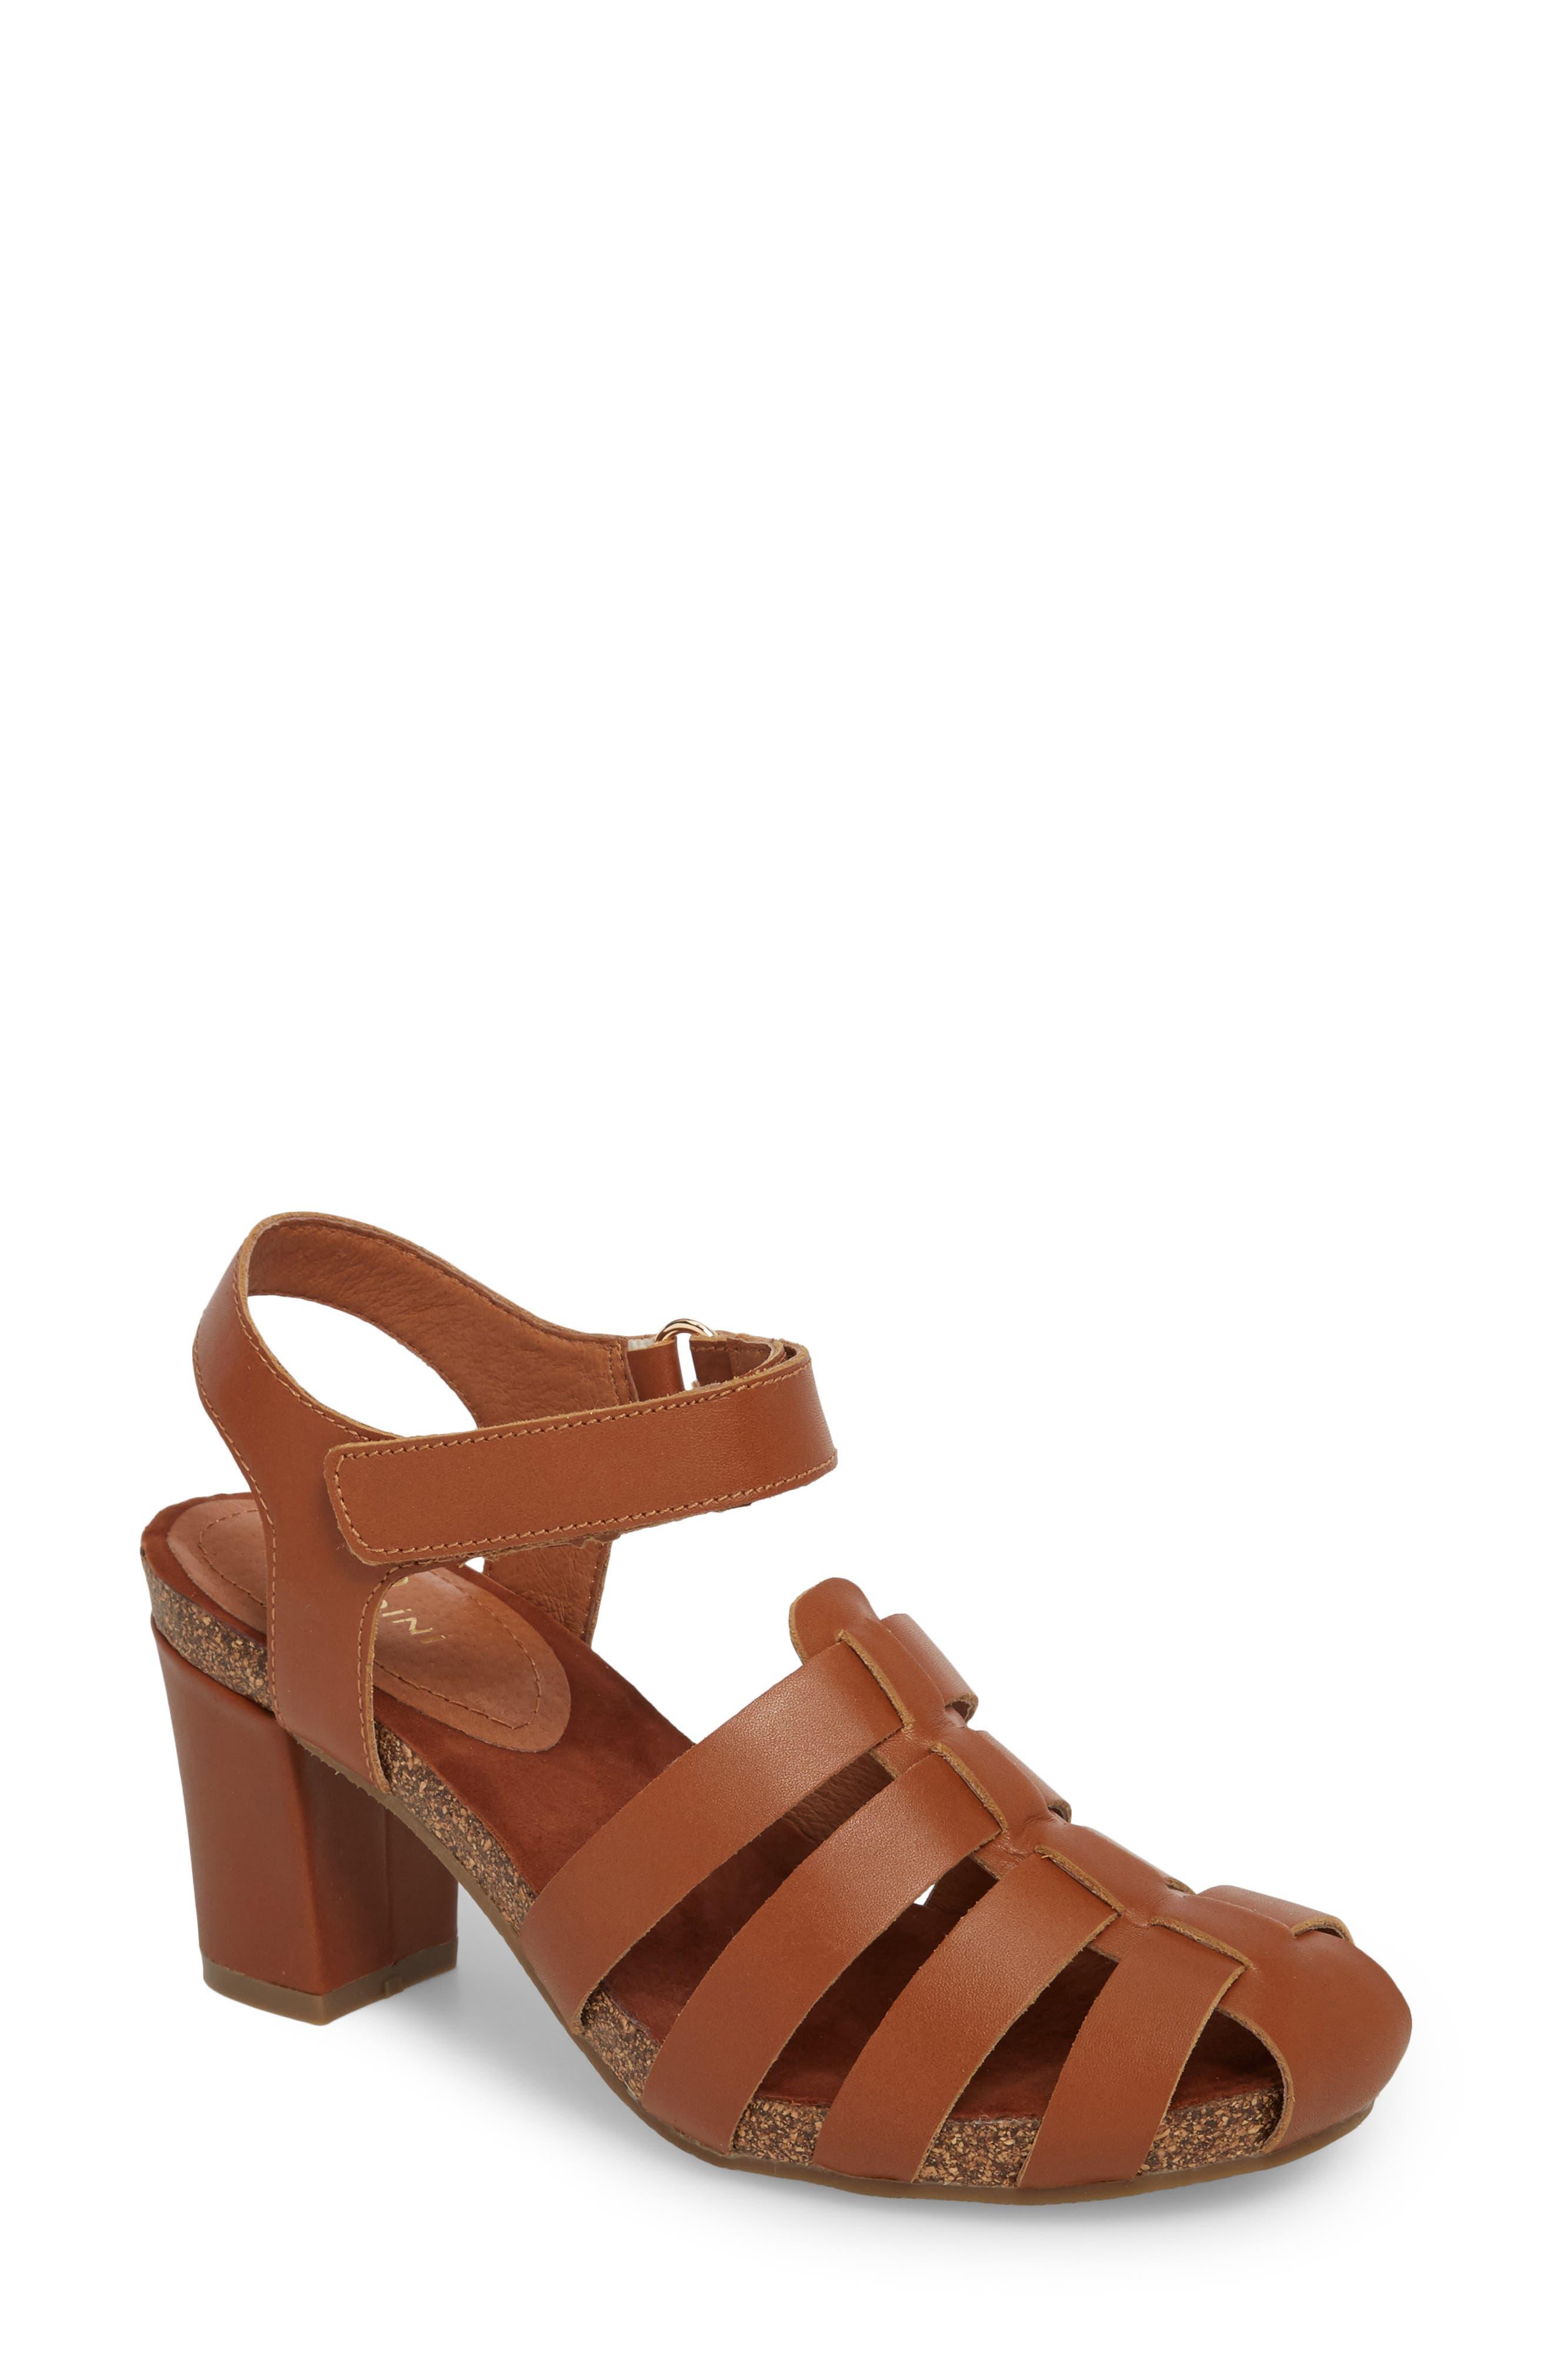 Carrara Block Heel Sandal,                         Main,                         color, Cognac Leather